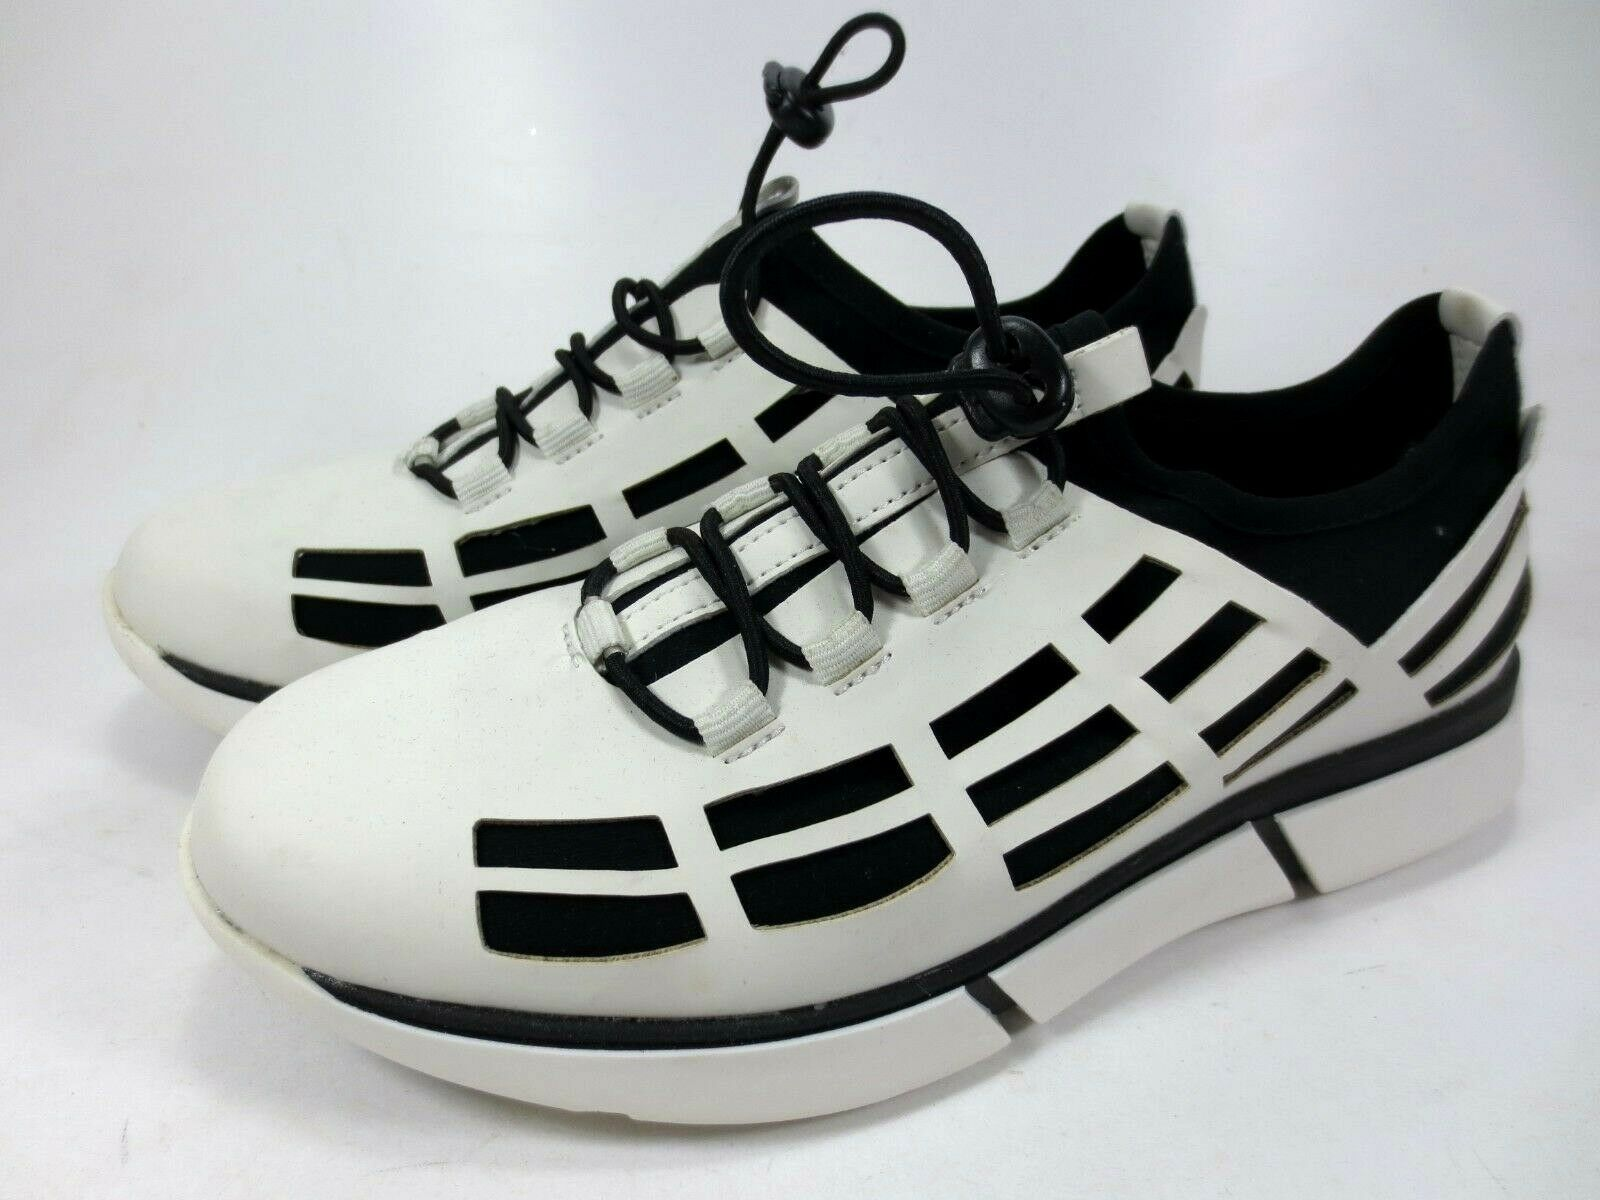 Gerry Weber Slipper scarpe da ginnastica Scarpe in Pelle Bianco Nero Nuovo 99,95 Scarpe Basse